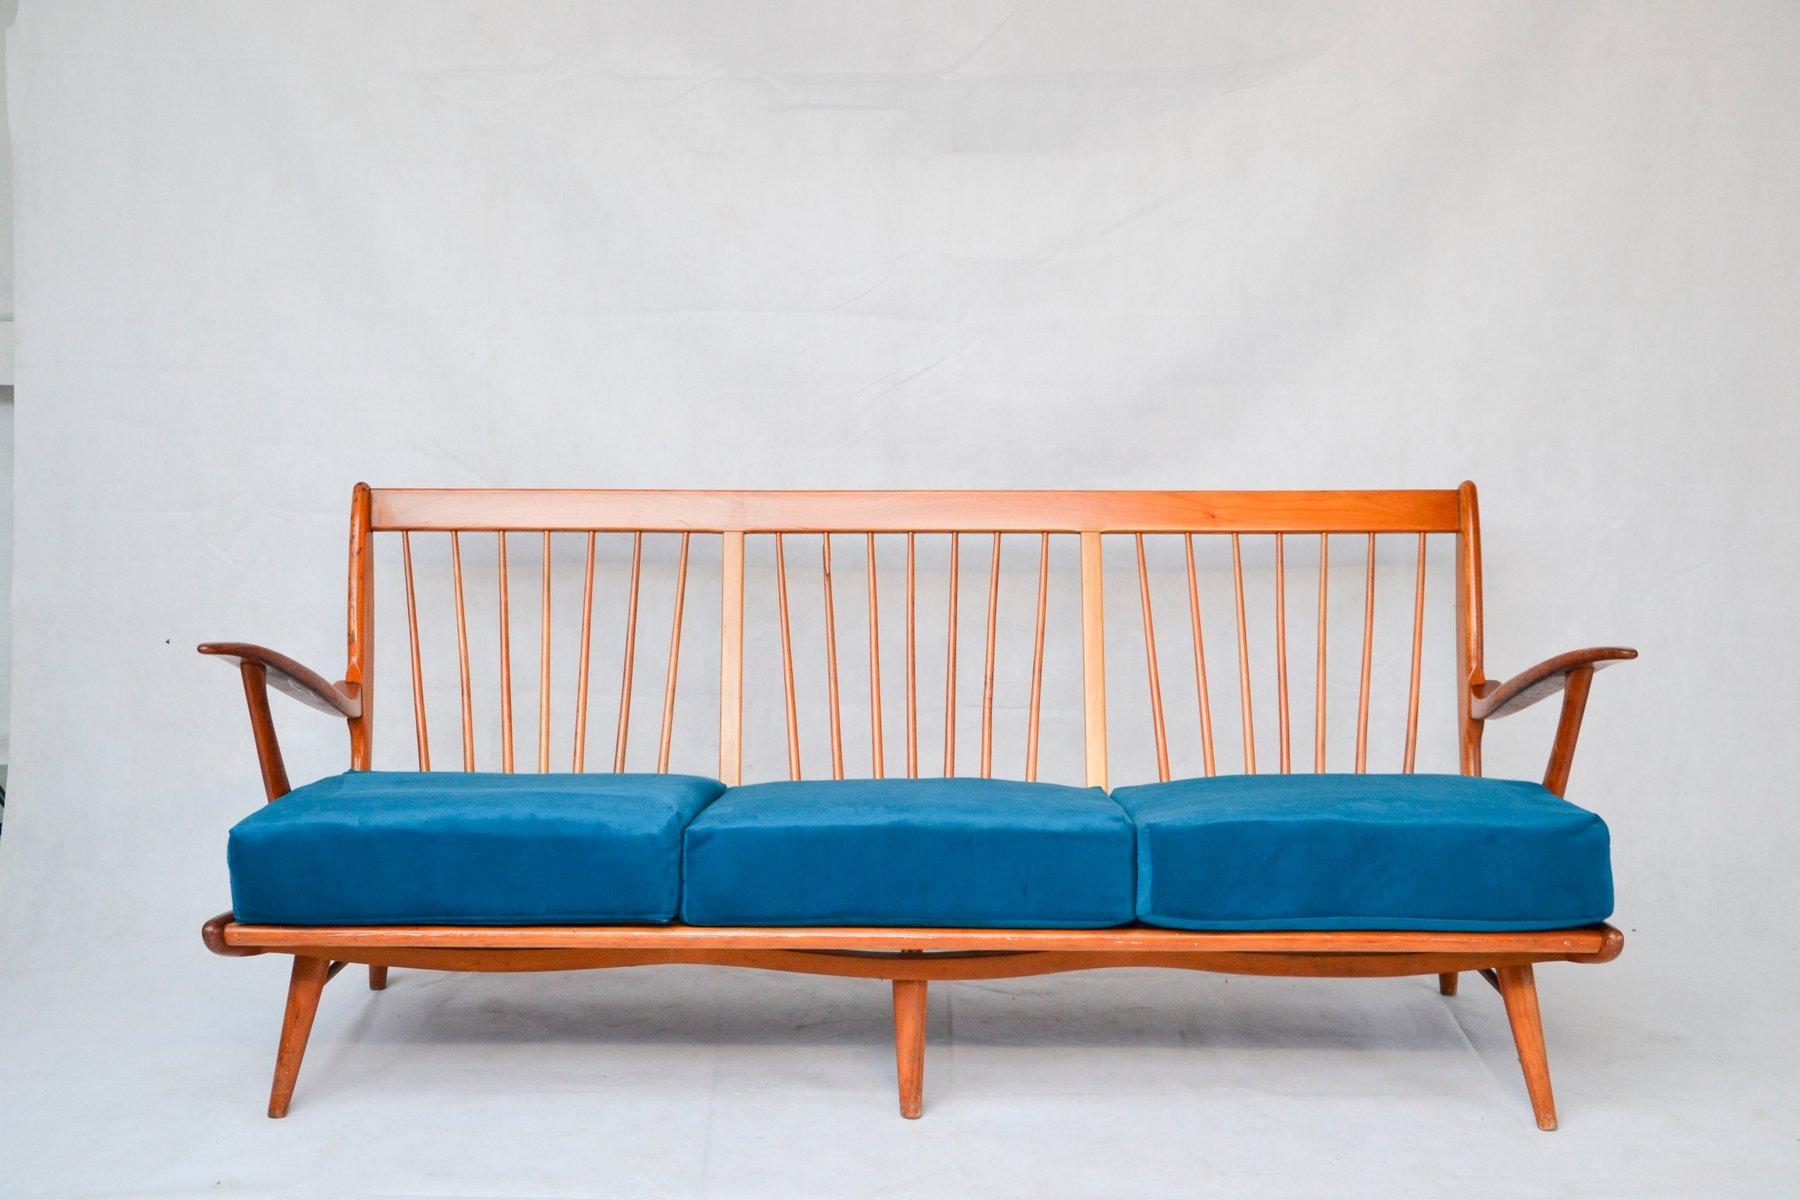 skandinavisches vintage sofa 1960er bei pamono kaufen. Black Bedroom Furniture Sets. Home Design Ideas